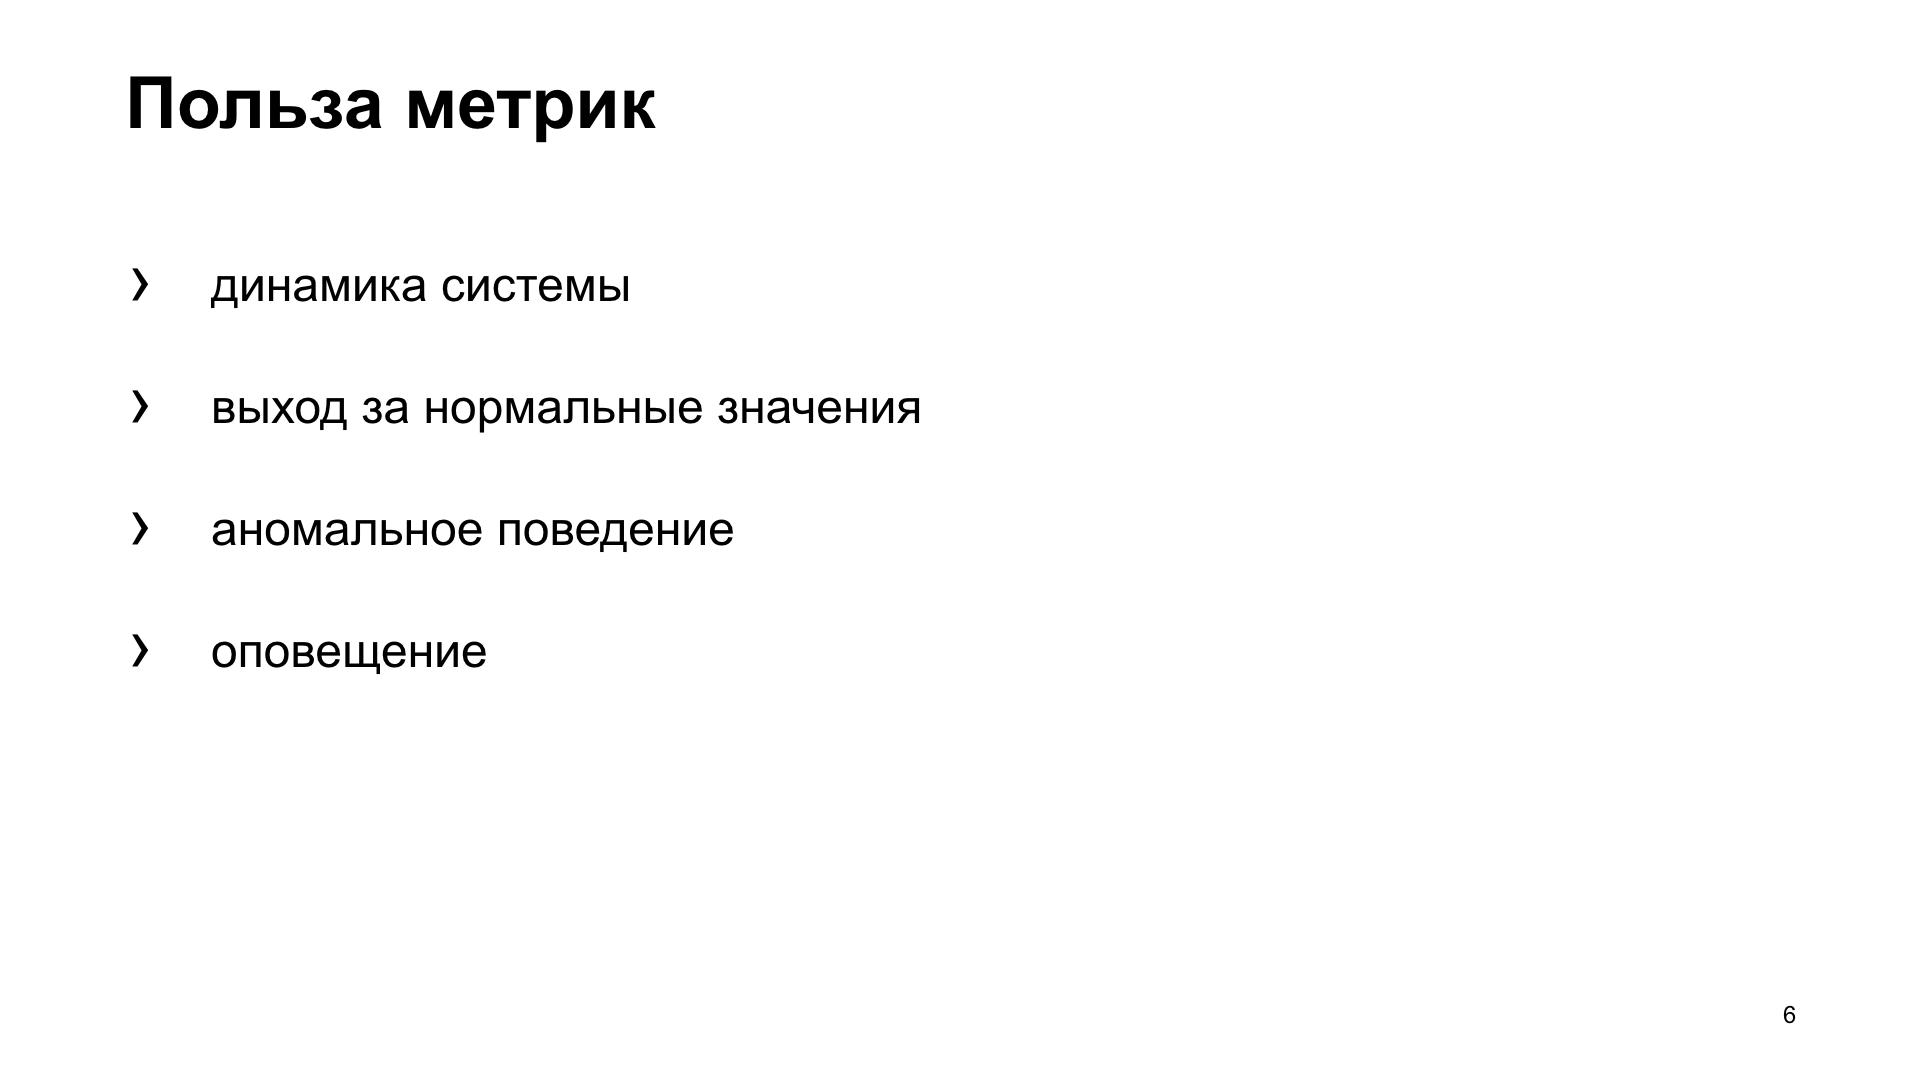 uWSGI в помощь метрикам. Доклад Яндекса - 2